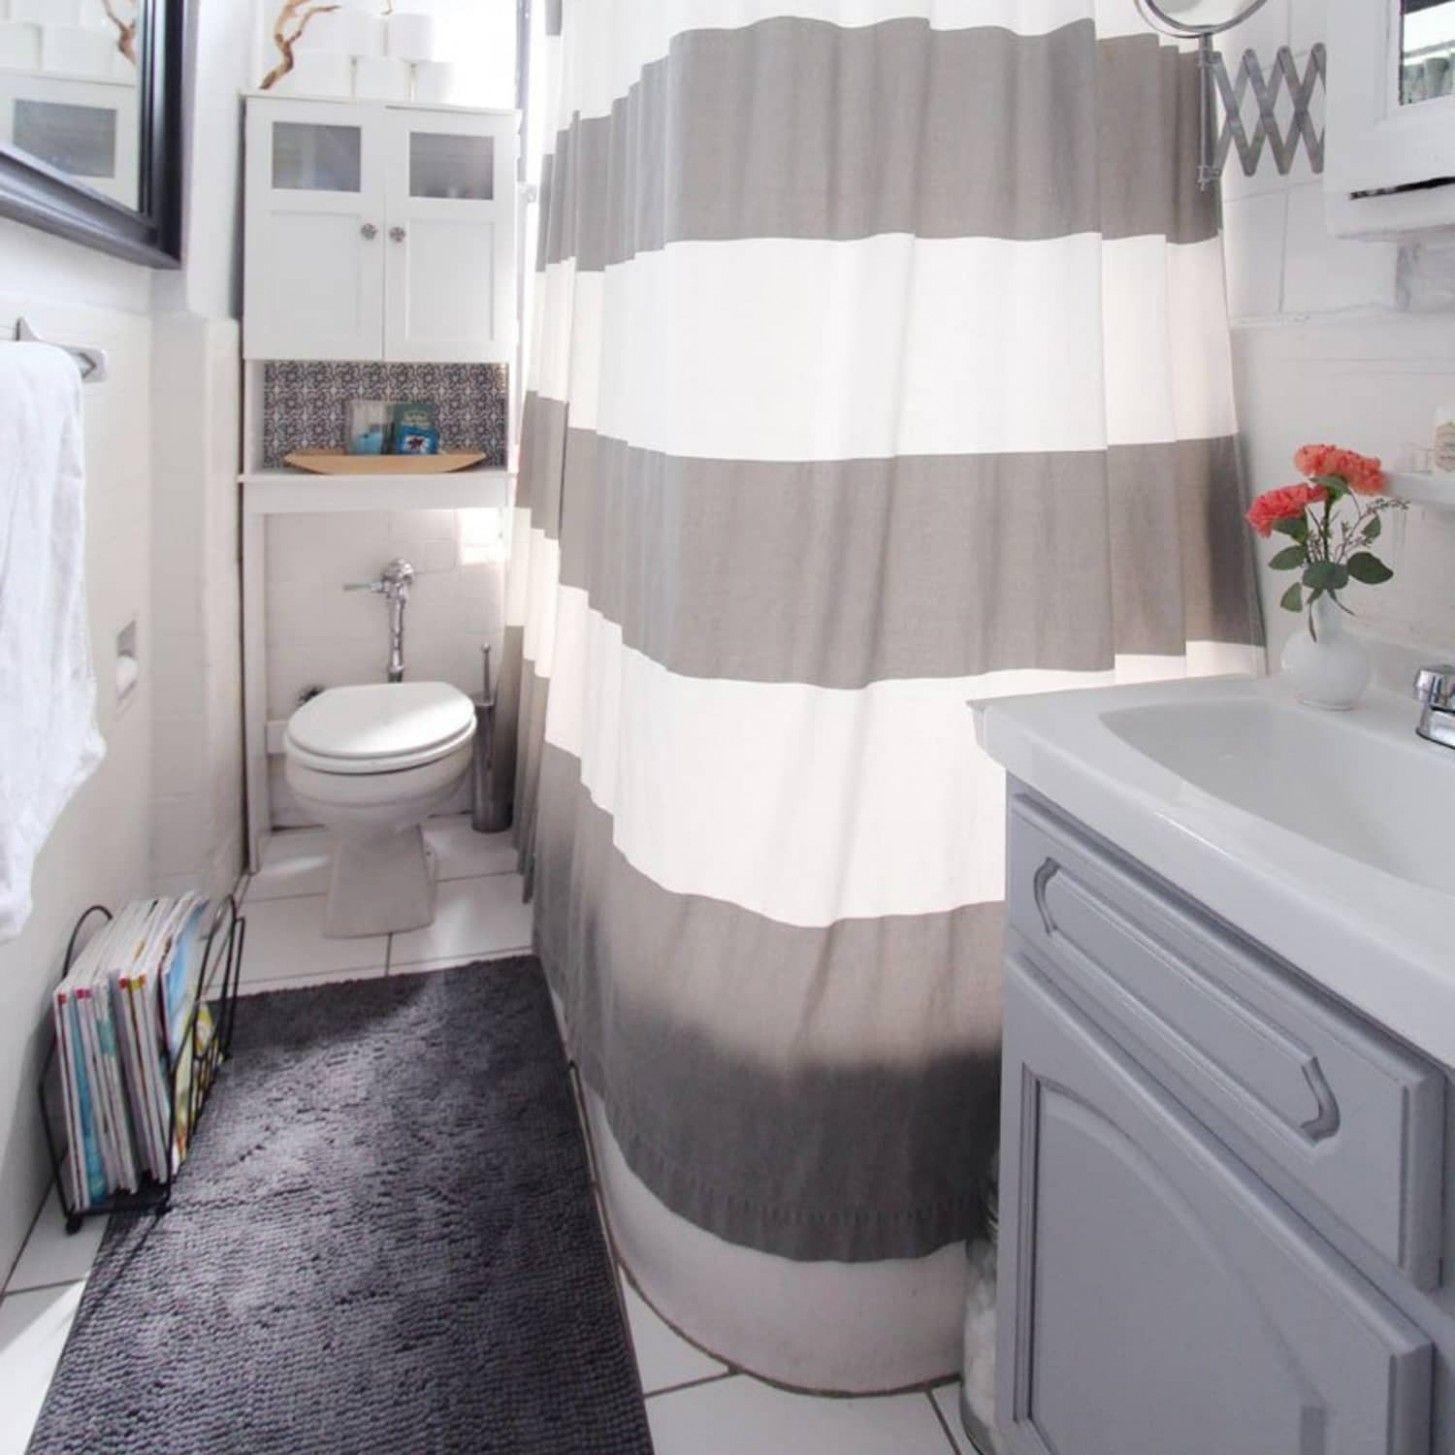 Badezimmer Vorhang Farbideen Badezimmer Farbideen Vorhang In 2020 Kid Bathroom Decor Diy Bathroom Decor Diy Bathroom